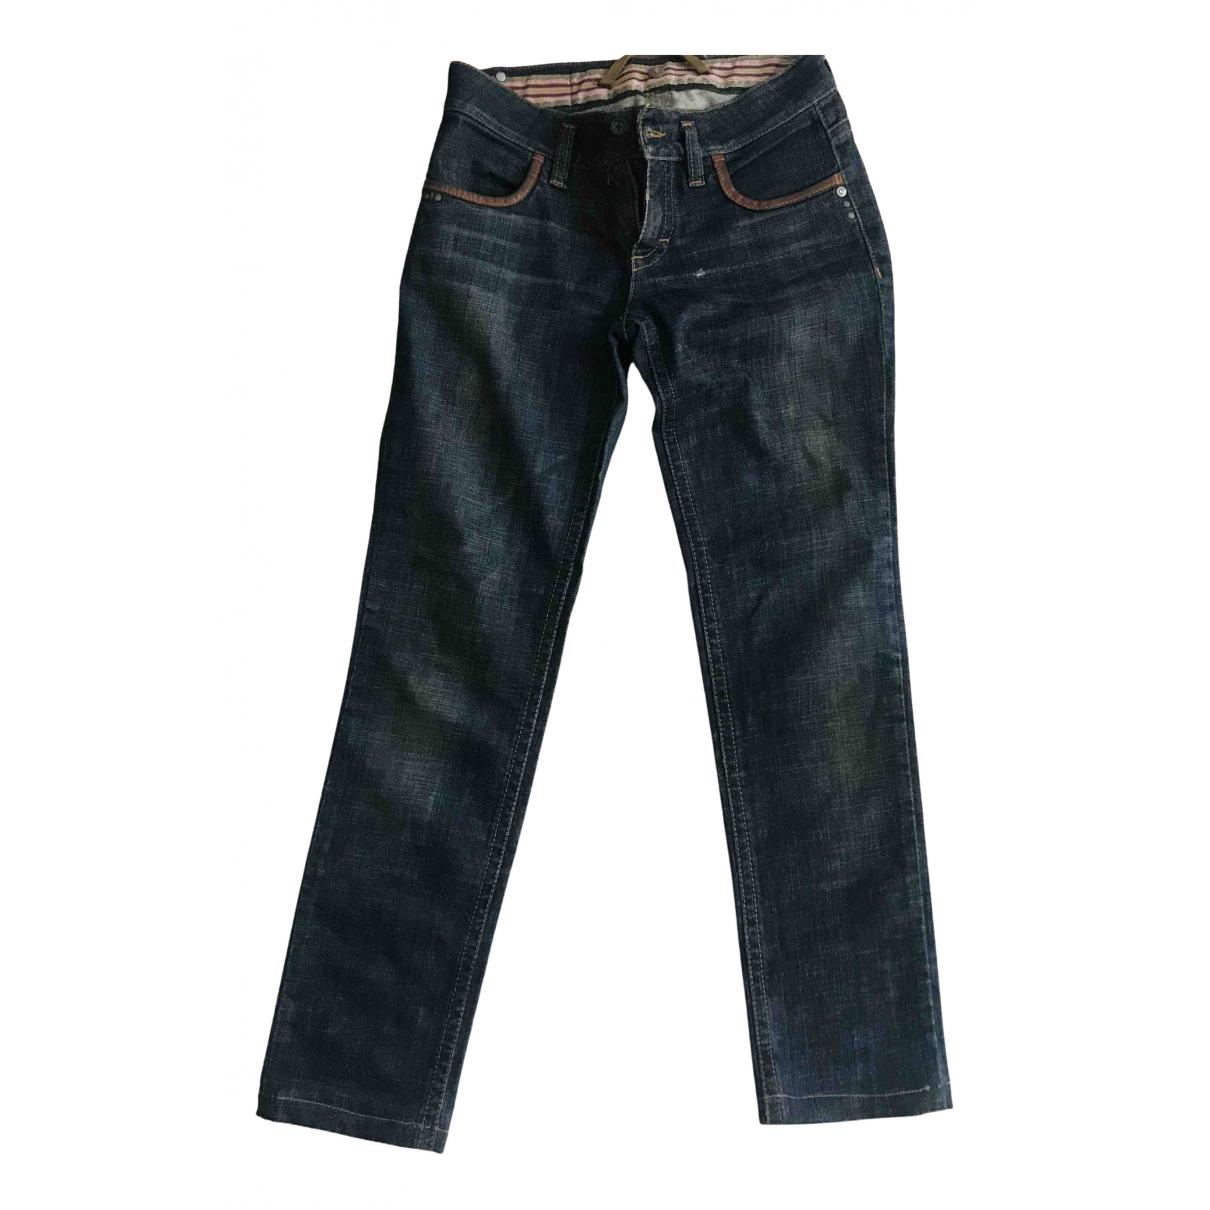 Gas N Blue Denim - Jeans Jeans for Women 27 US